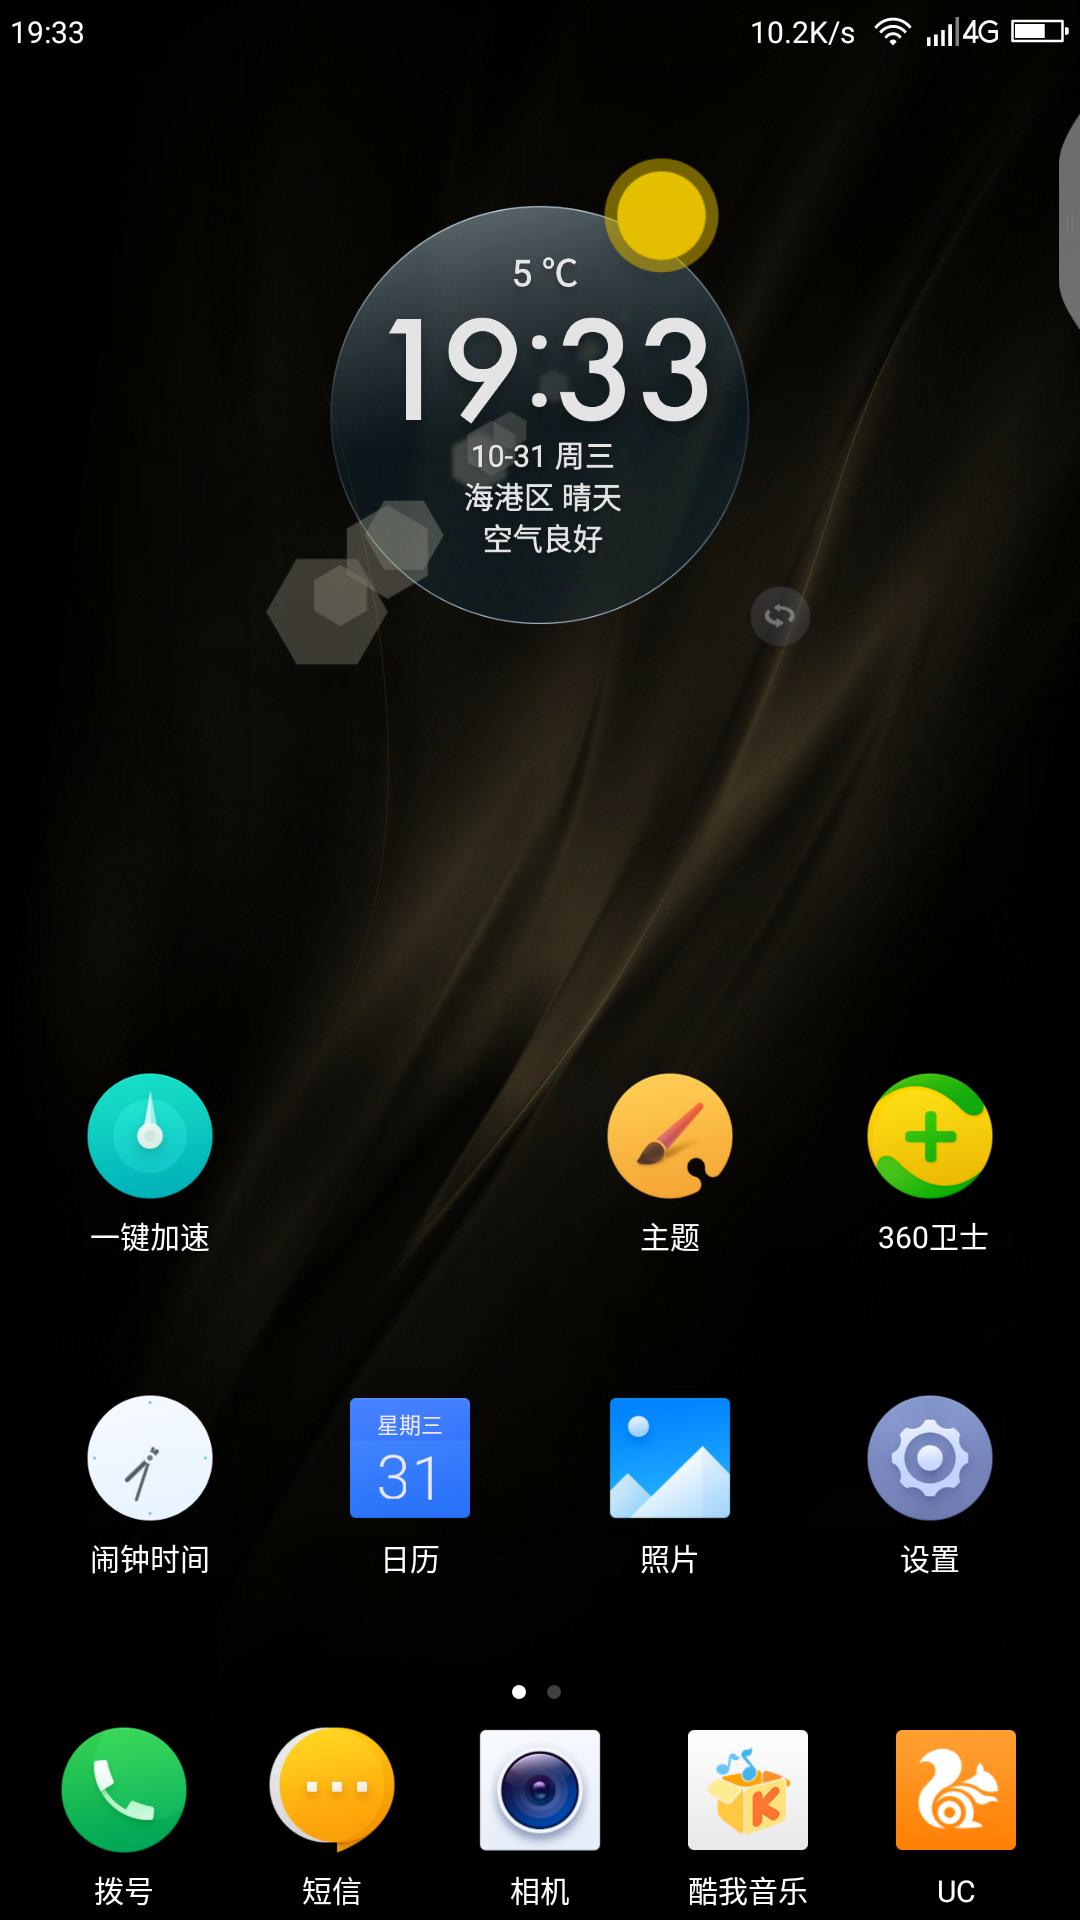 Screenshot_2018-10-31-19-33-17.png